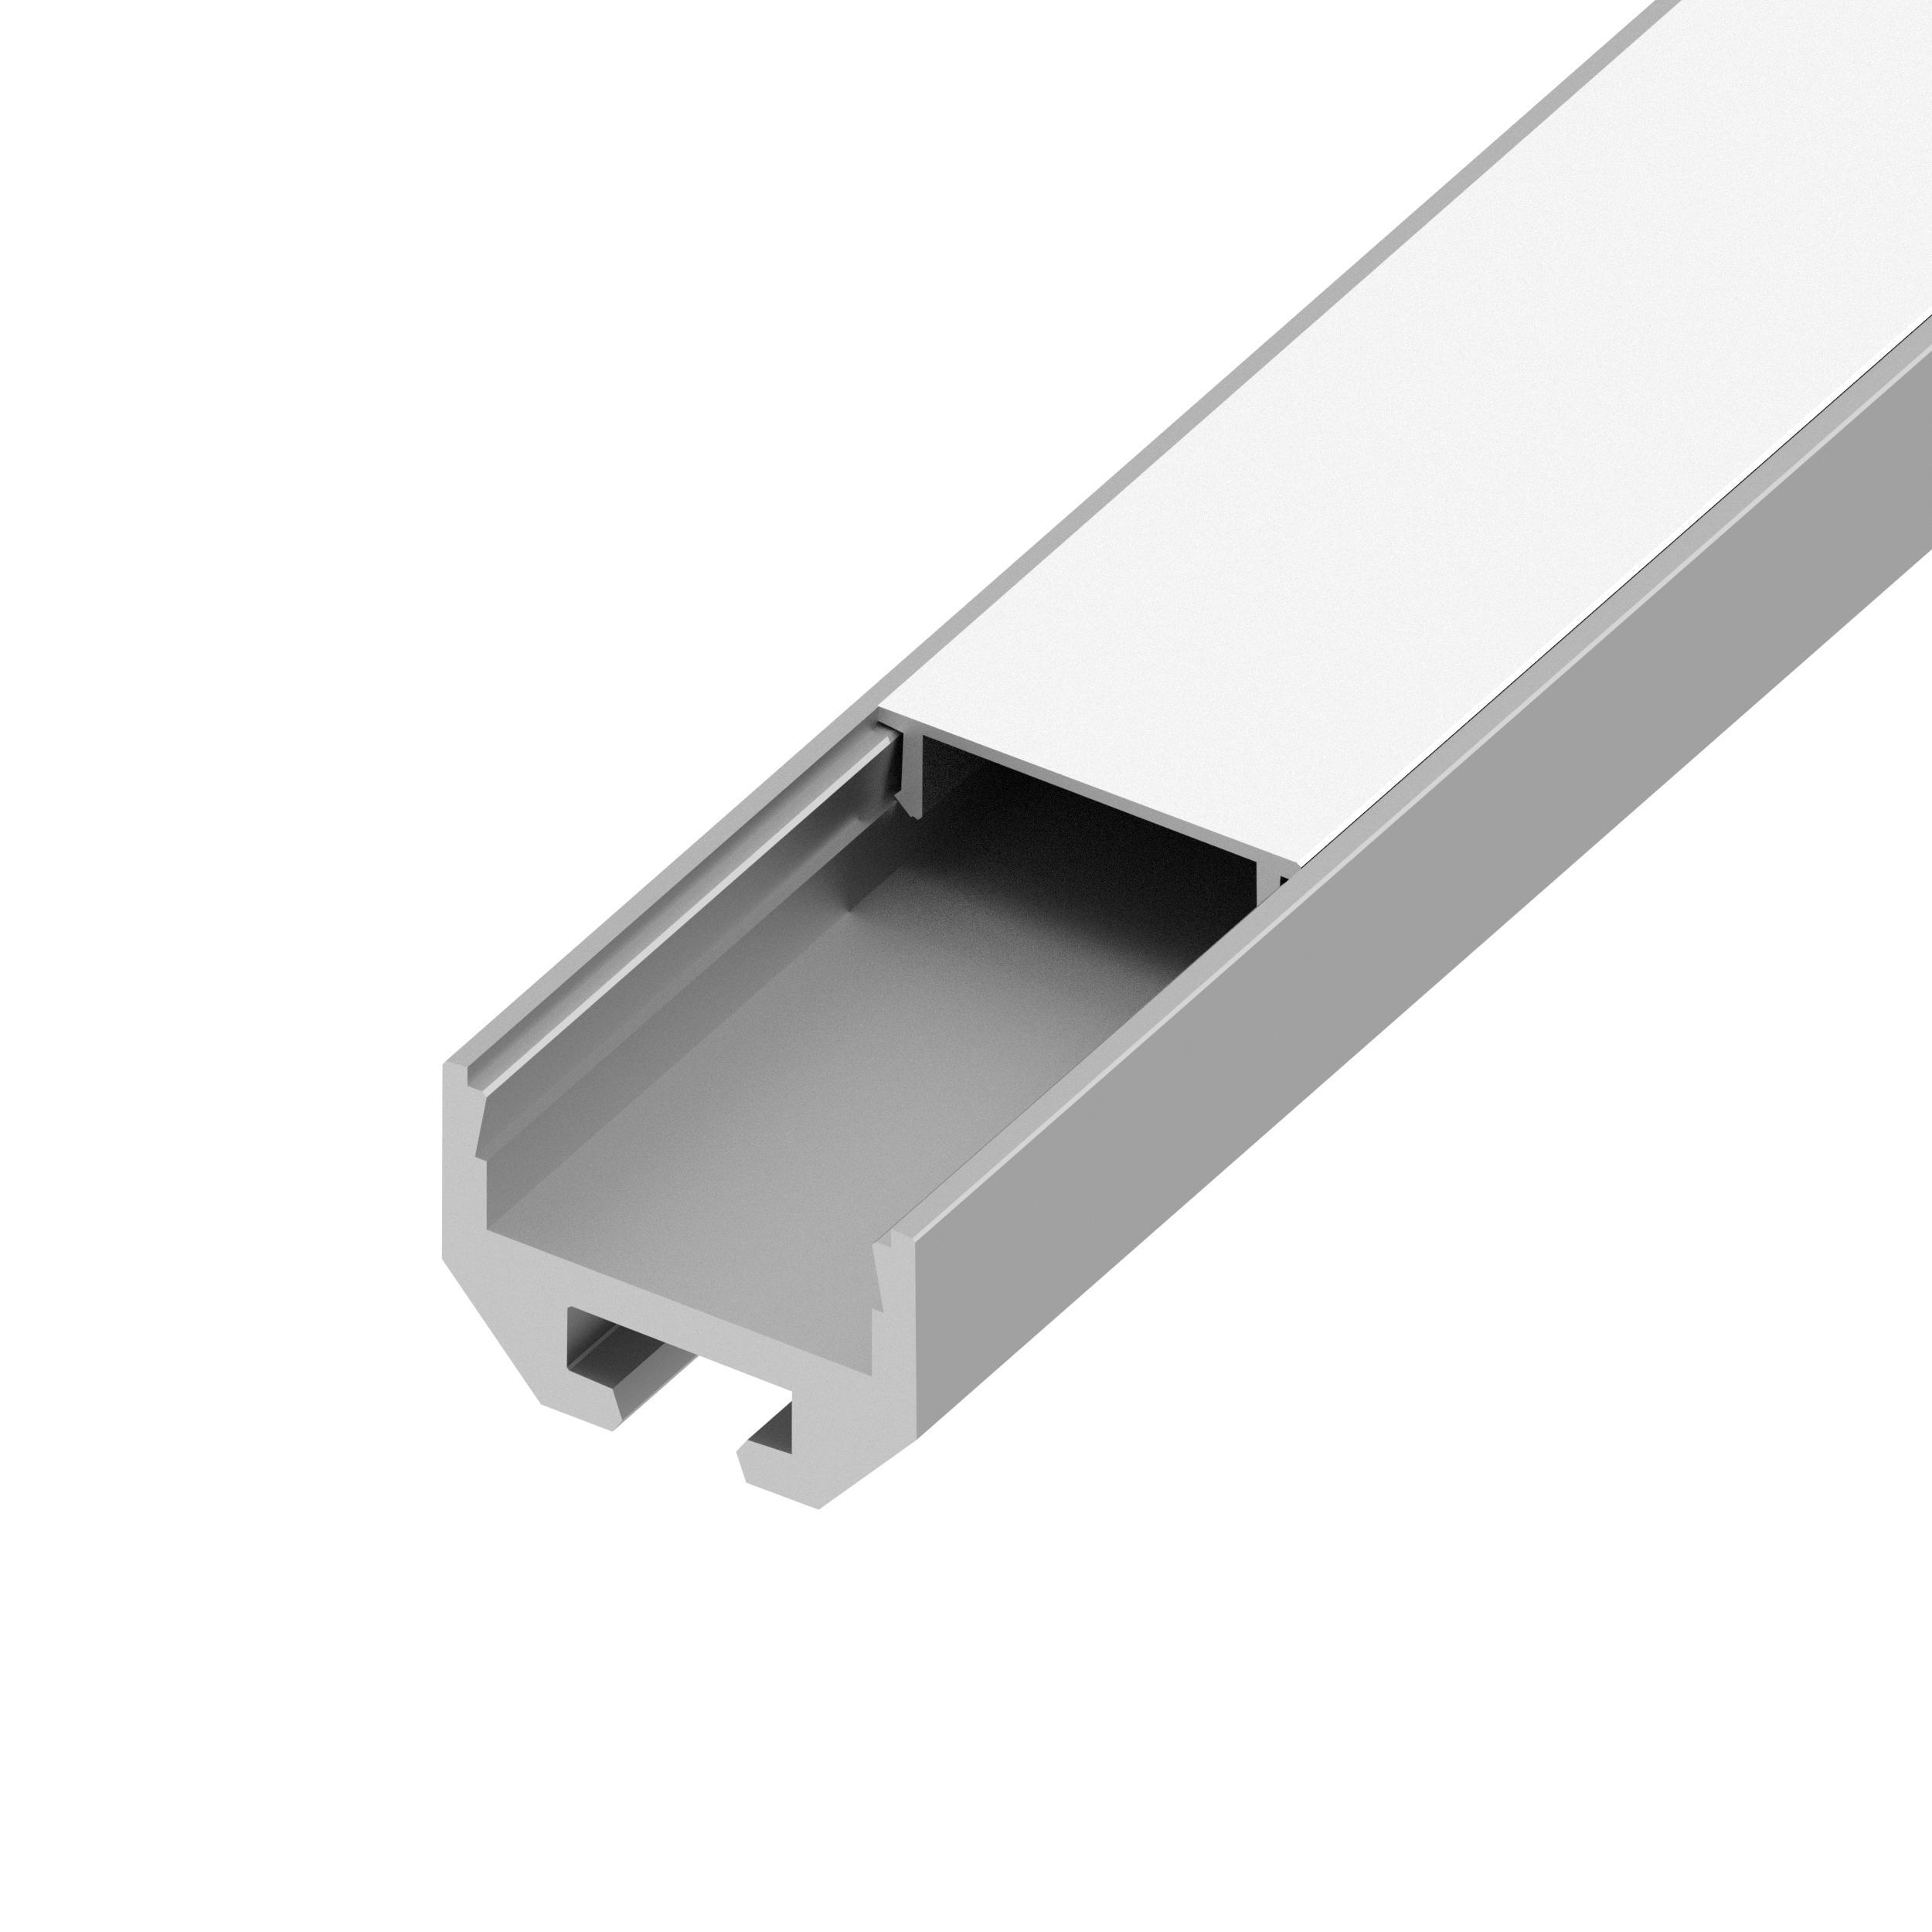 CHROMAPATH® Builder Channels & Accessories - SQUARE